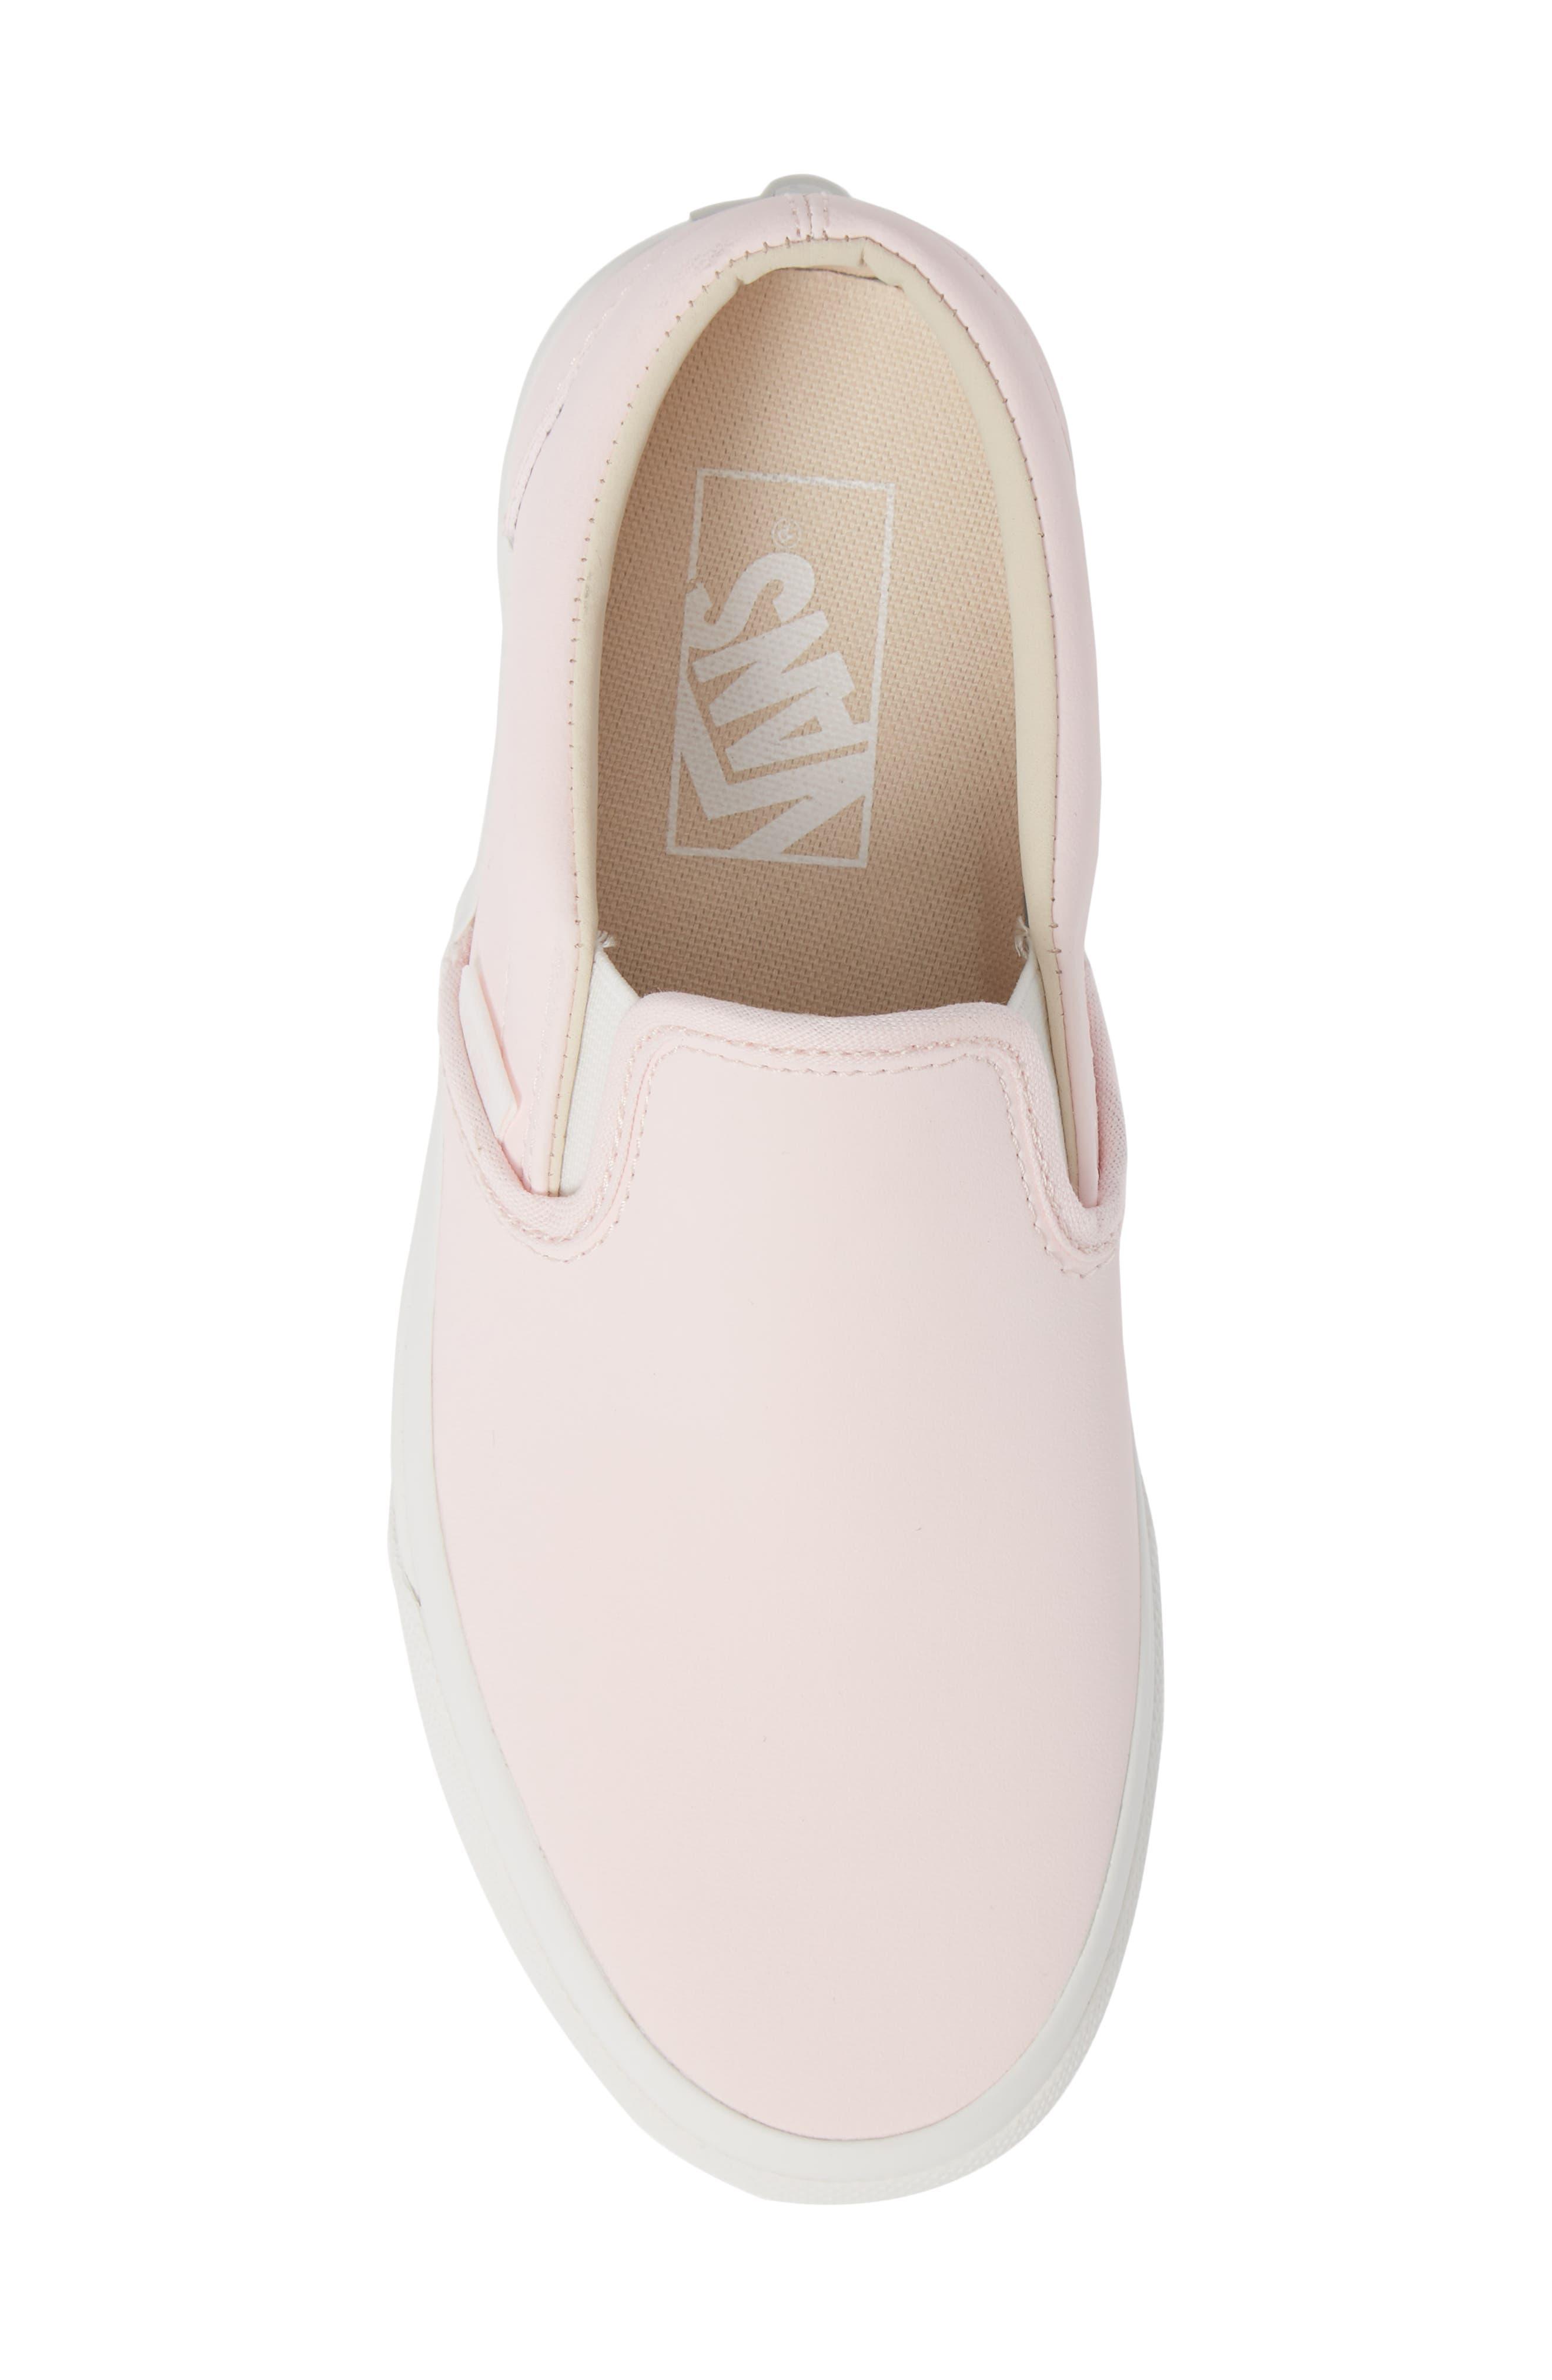 UA Classic Slip-On Sneaker,                             Alternate thumbnail 5, color,                             680